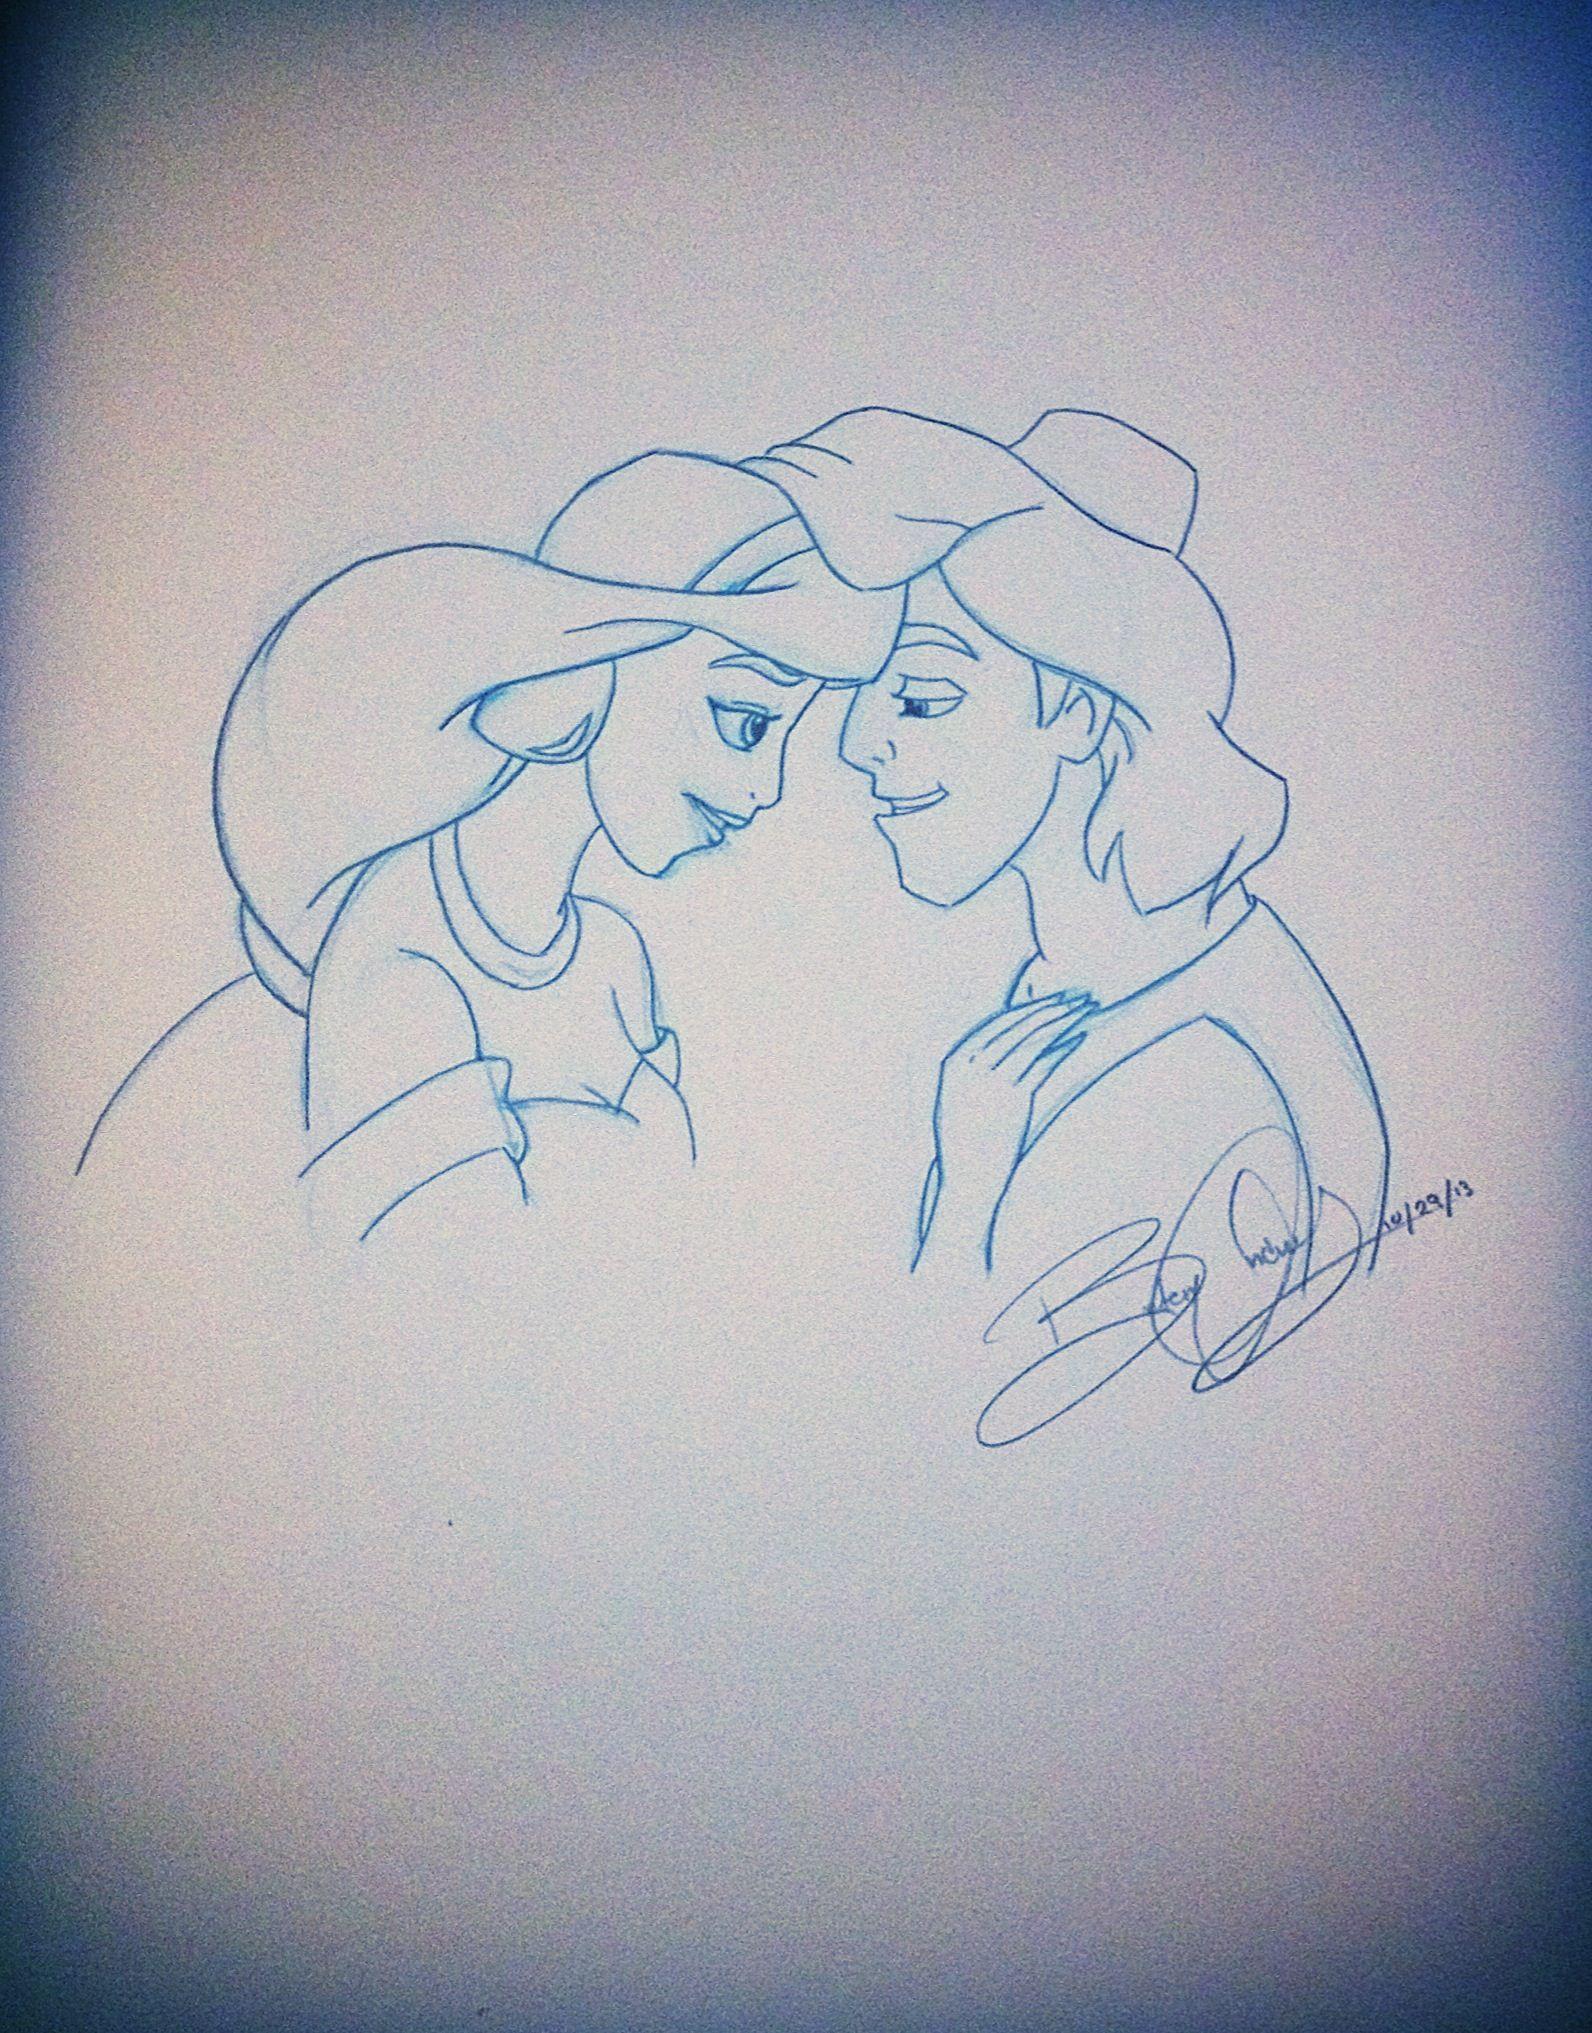 Disney couples sketch aladdin and jasmine disney drawing disney art disney artist artwork art sketching sketch disney princess aladdin jasmine